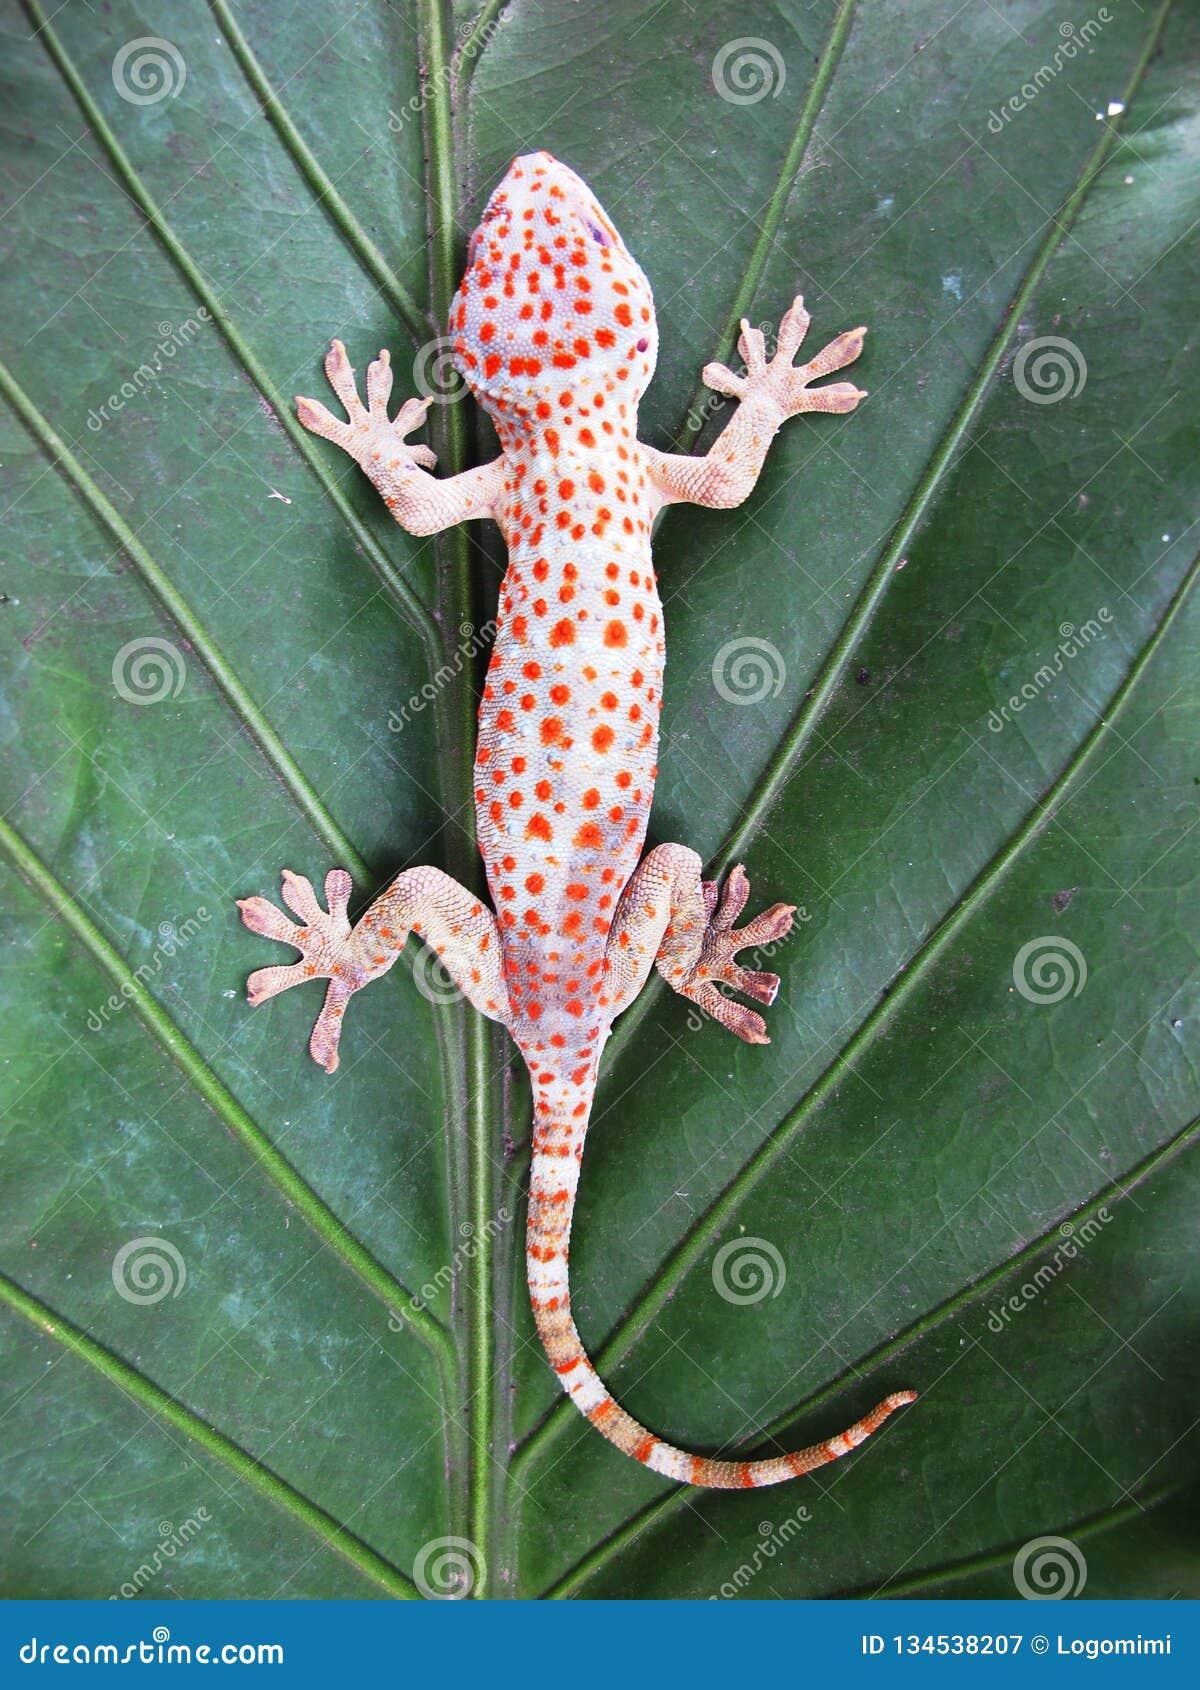 Tokay-Gecko-Gecko-Gecko auf grünem Blatt